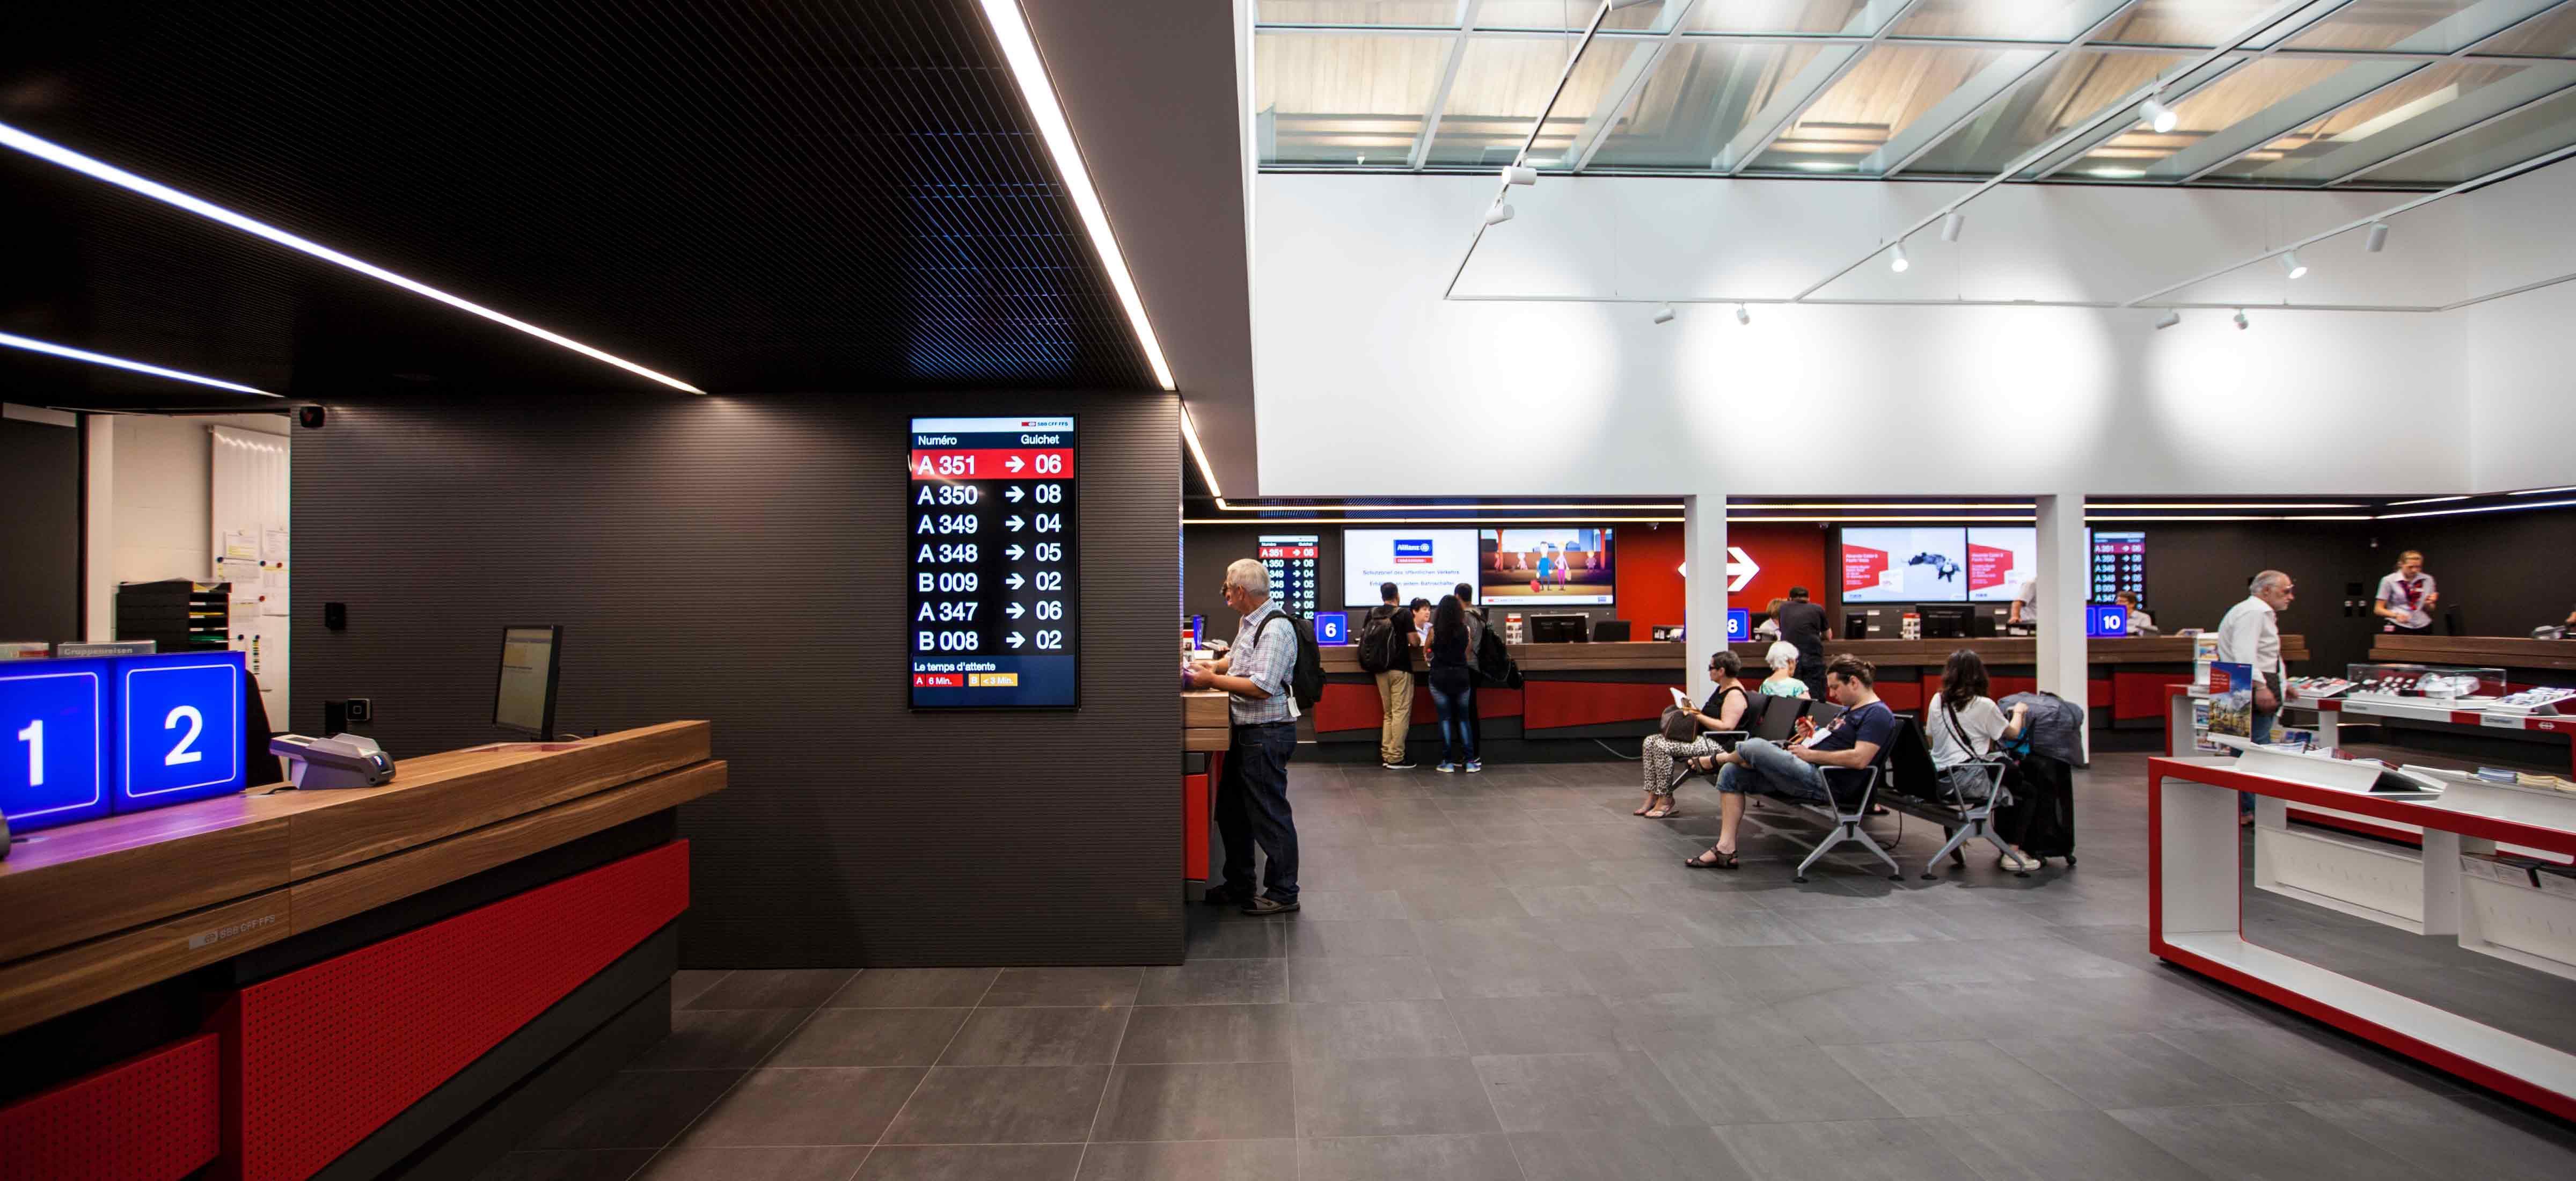 Einbau Reisebüro im Bahnhof Basel SBB